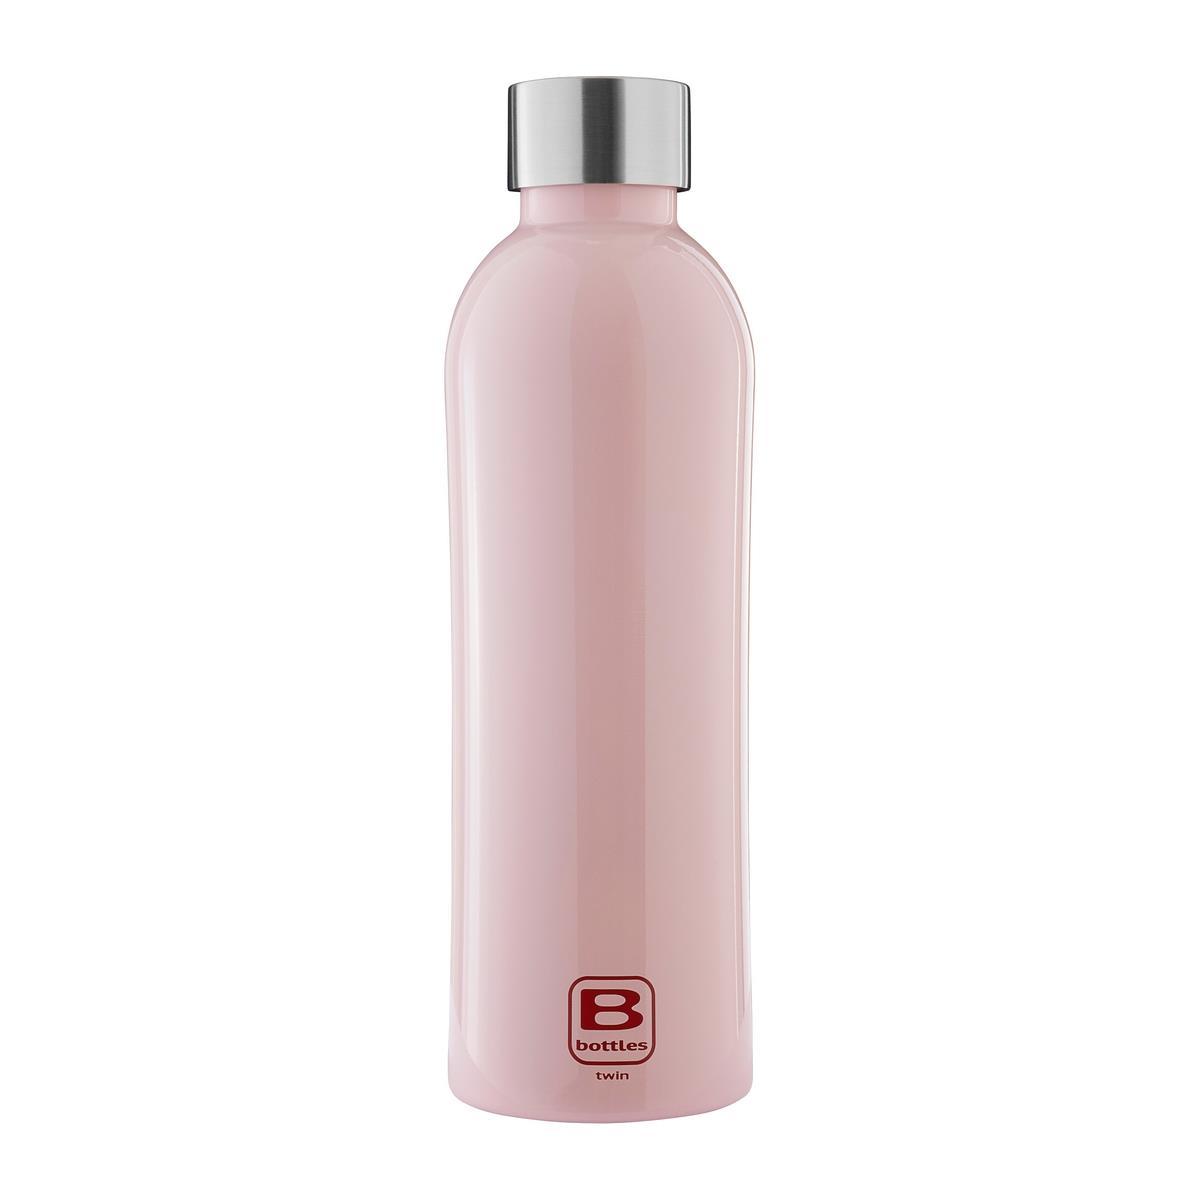 B Bottles Twin - Pink - 800 ml - Bottiglia Termica a doppia parete in acciaio inox 18/10